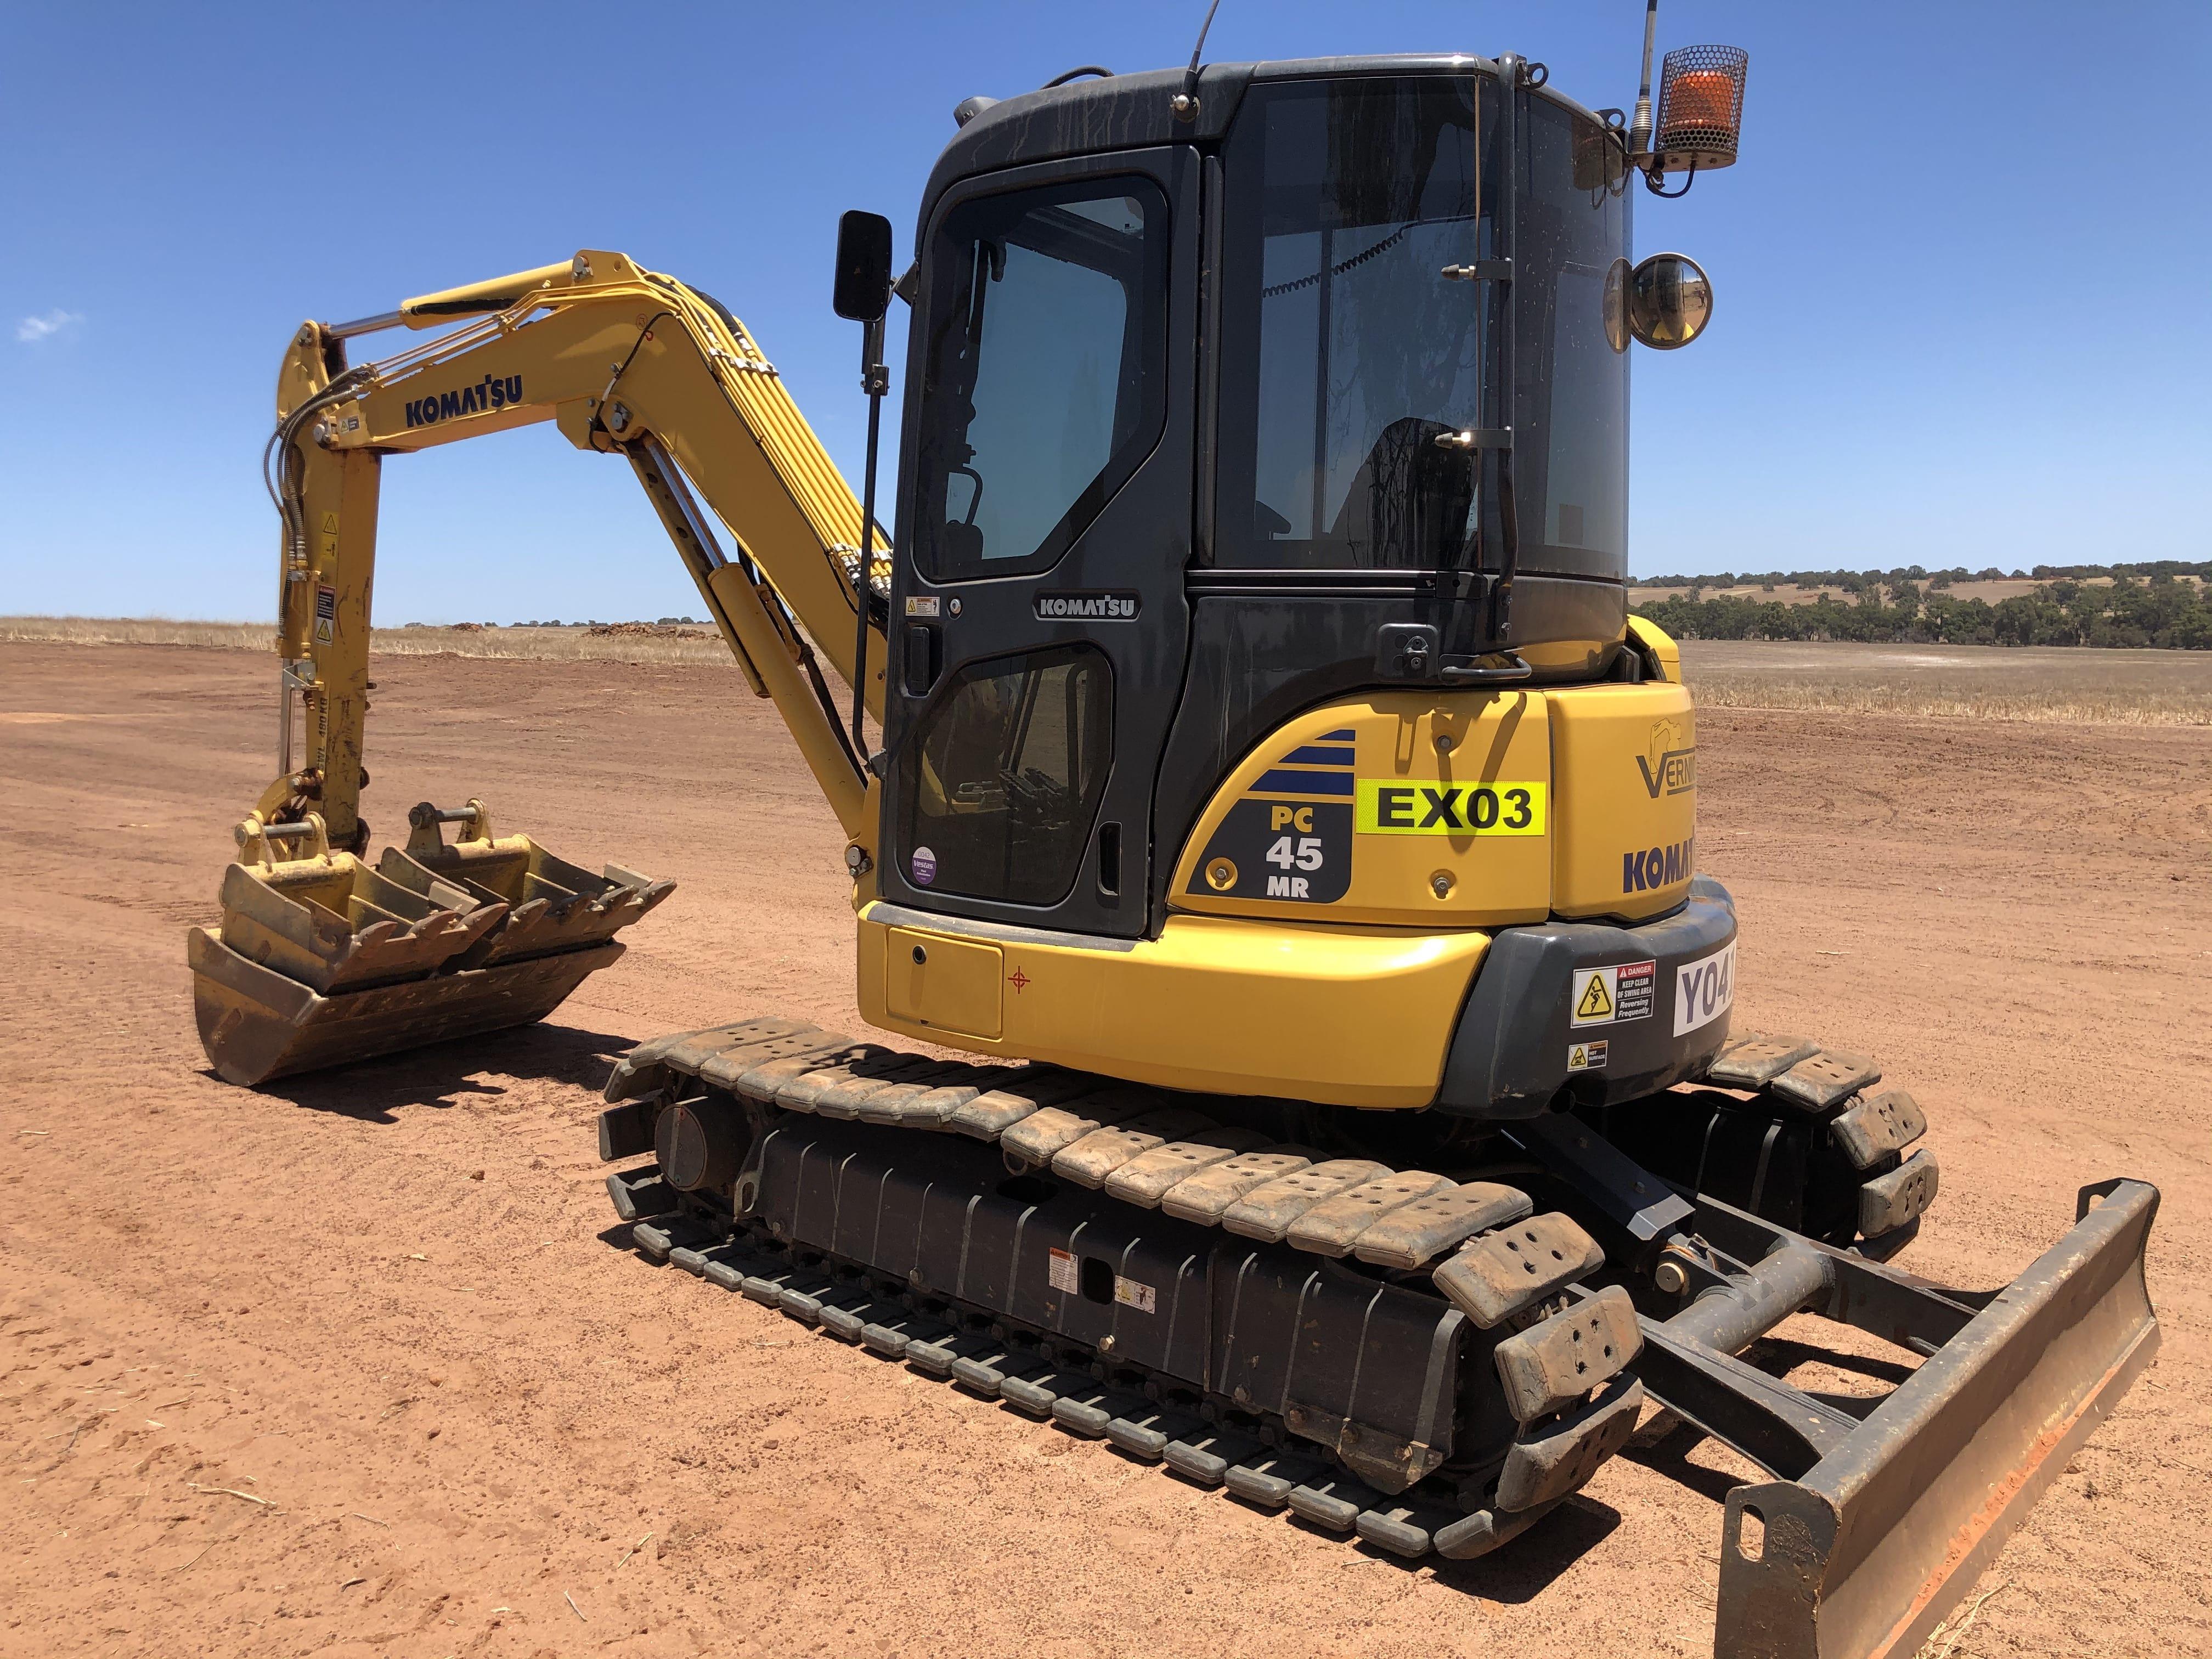 2.5 t excavator hire vernice western australia